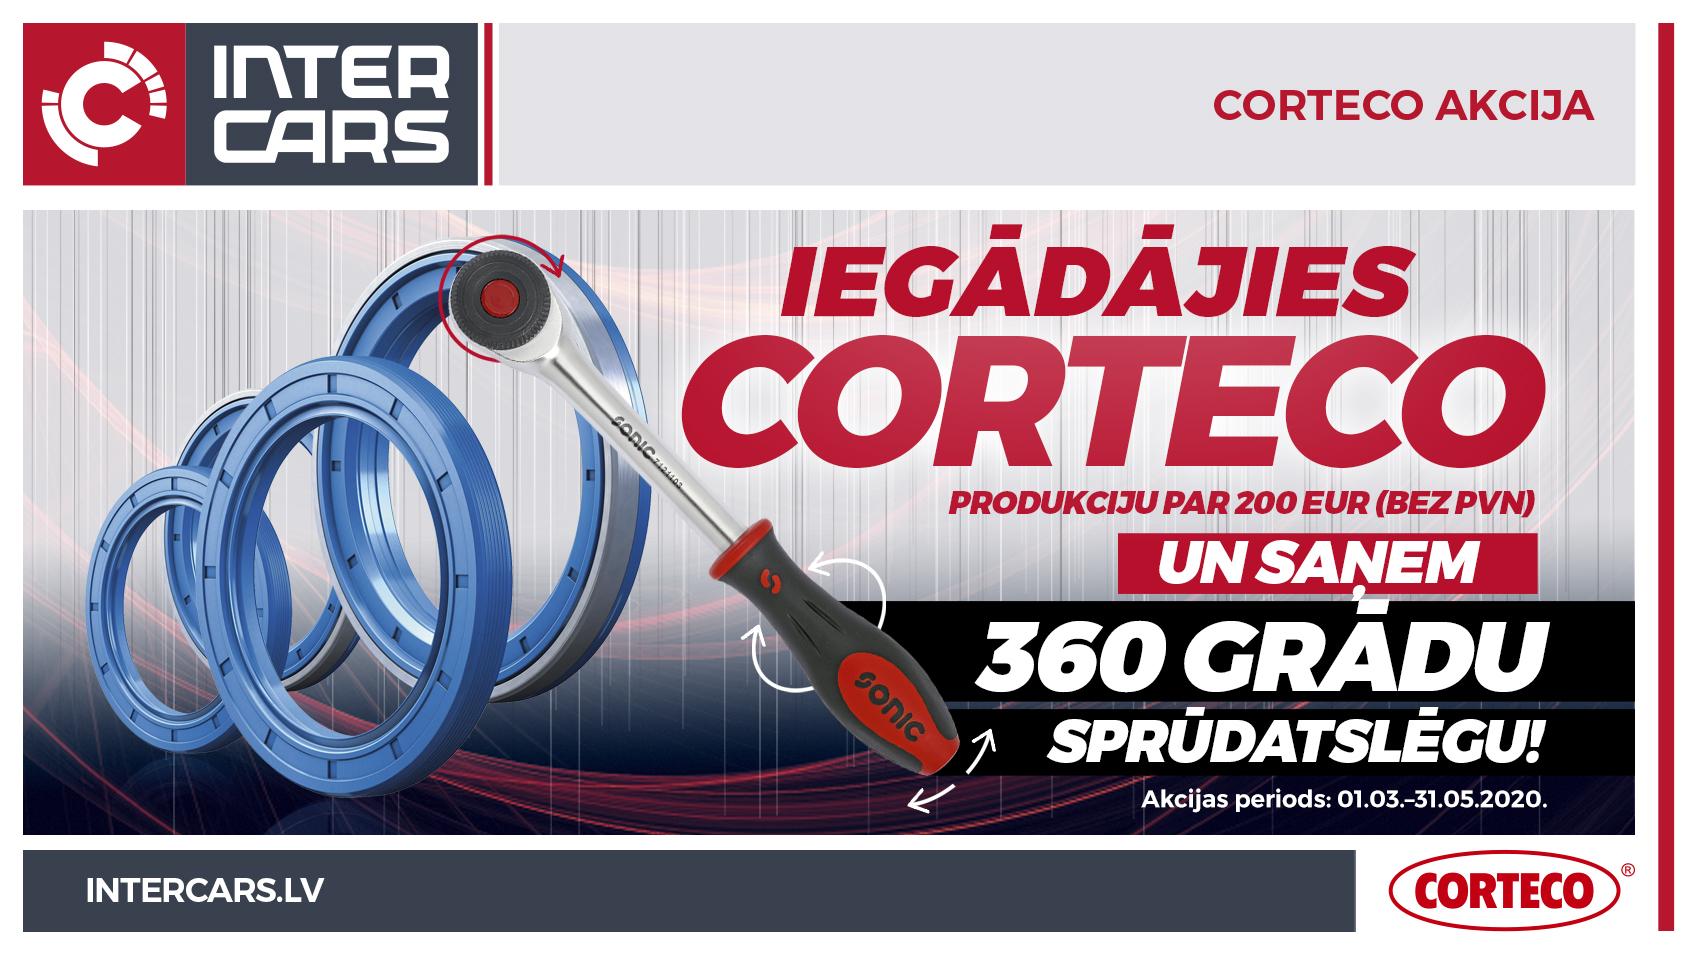 CORTECO-akcija-mar2020screen.jpg